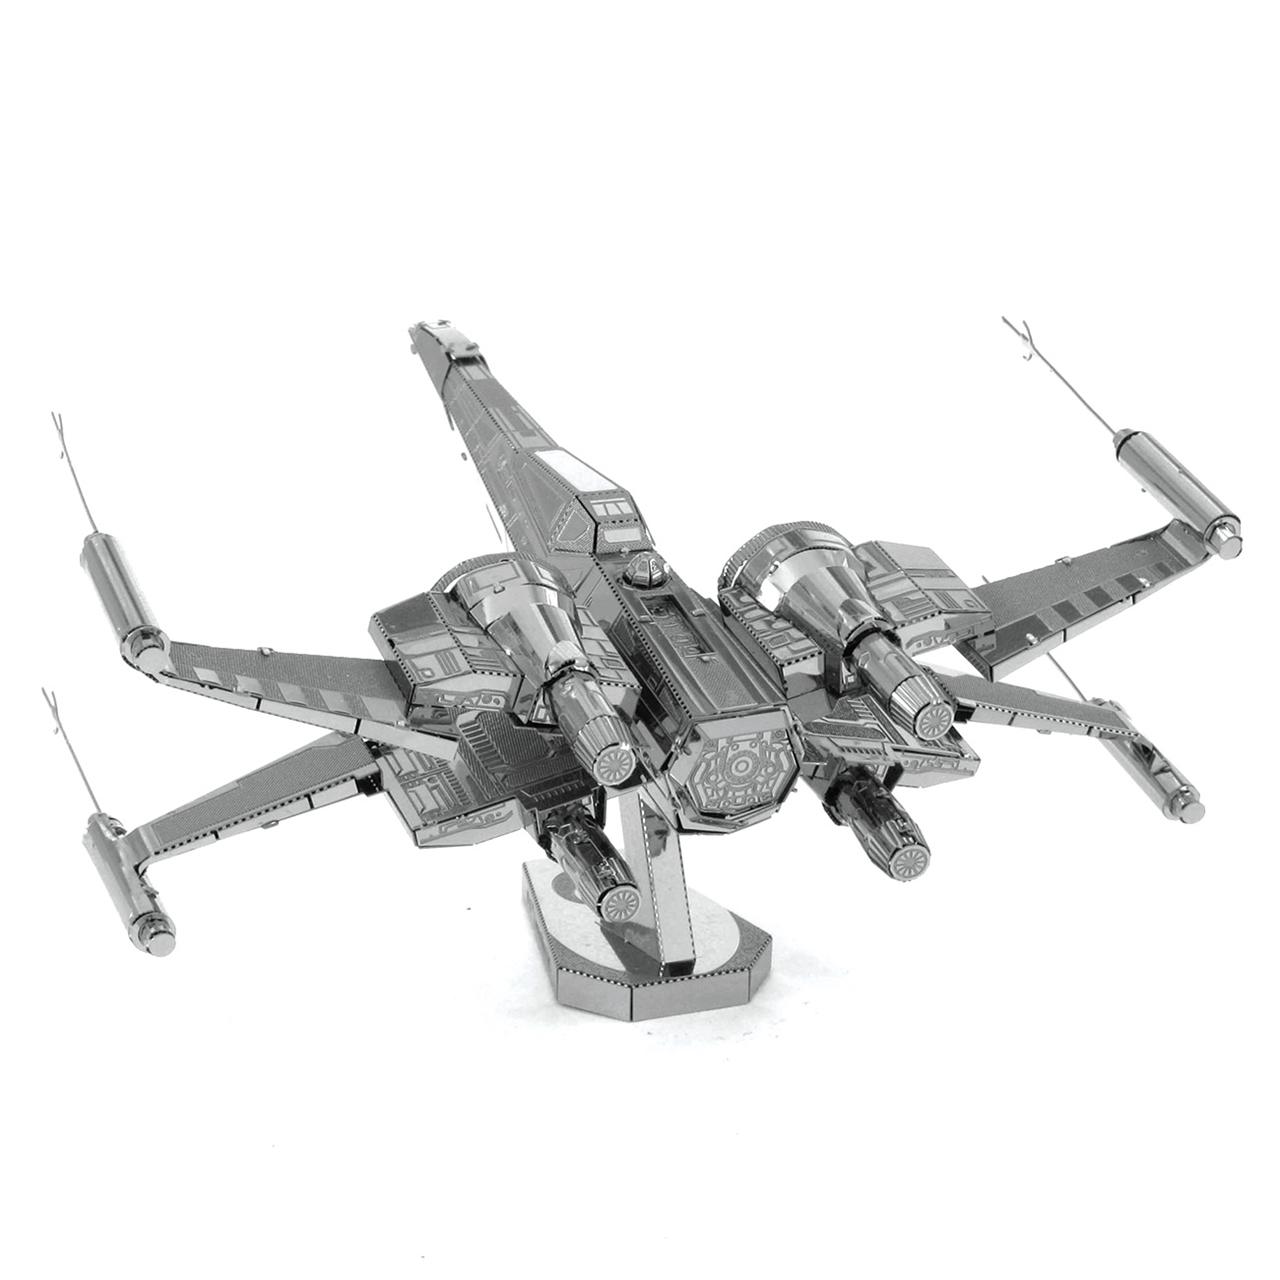 Fascinations Metal Earth Star Wars Model Kit Classic X-Wing /& Poe Dameron X-Wing